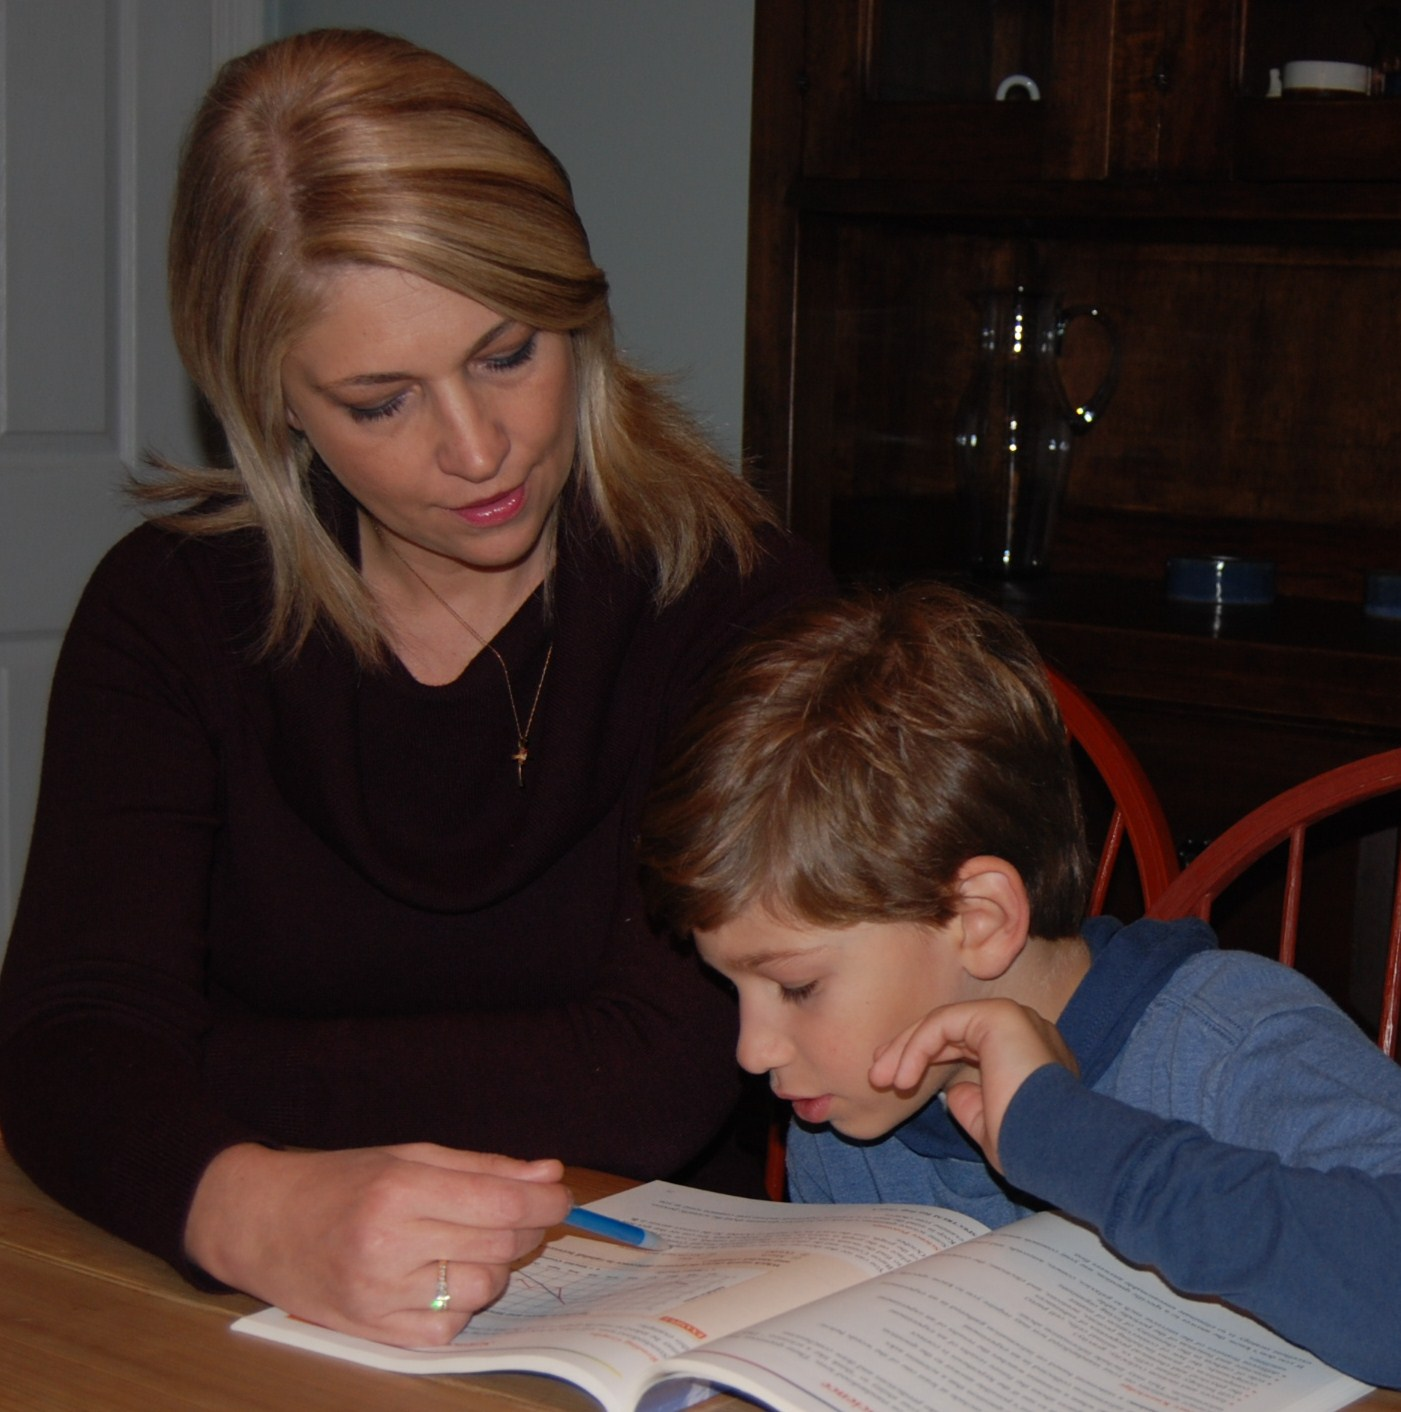 Academic homework services